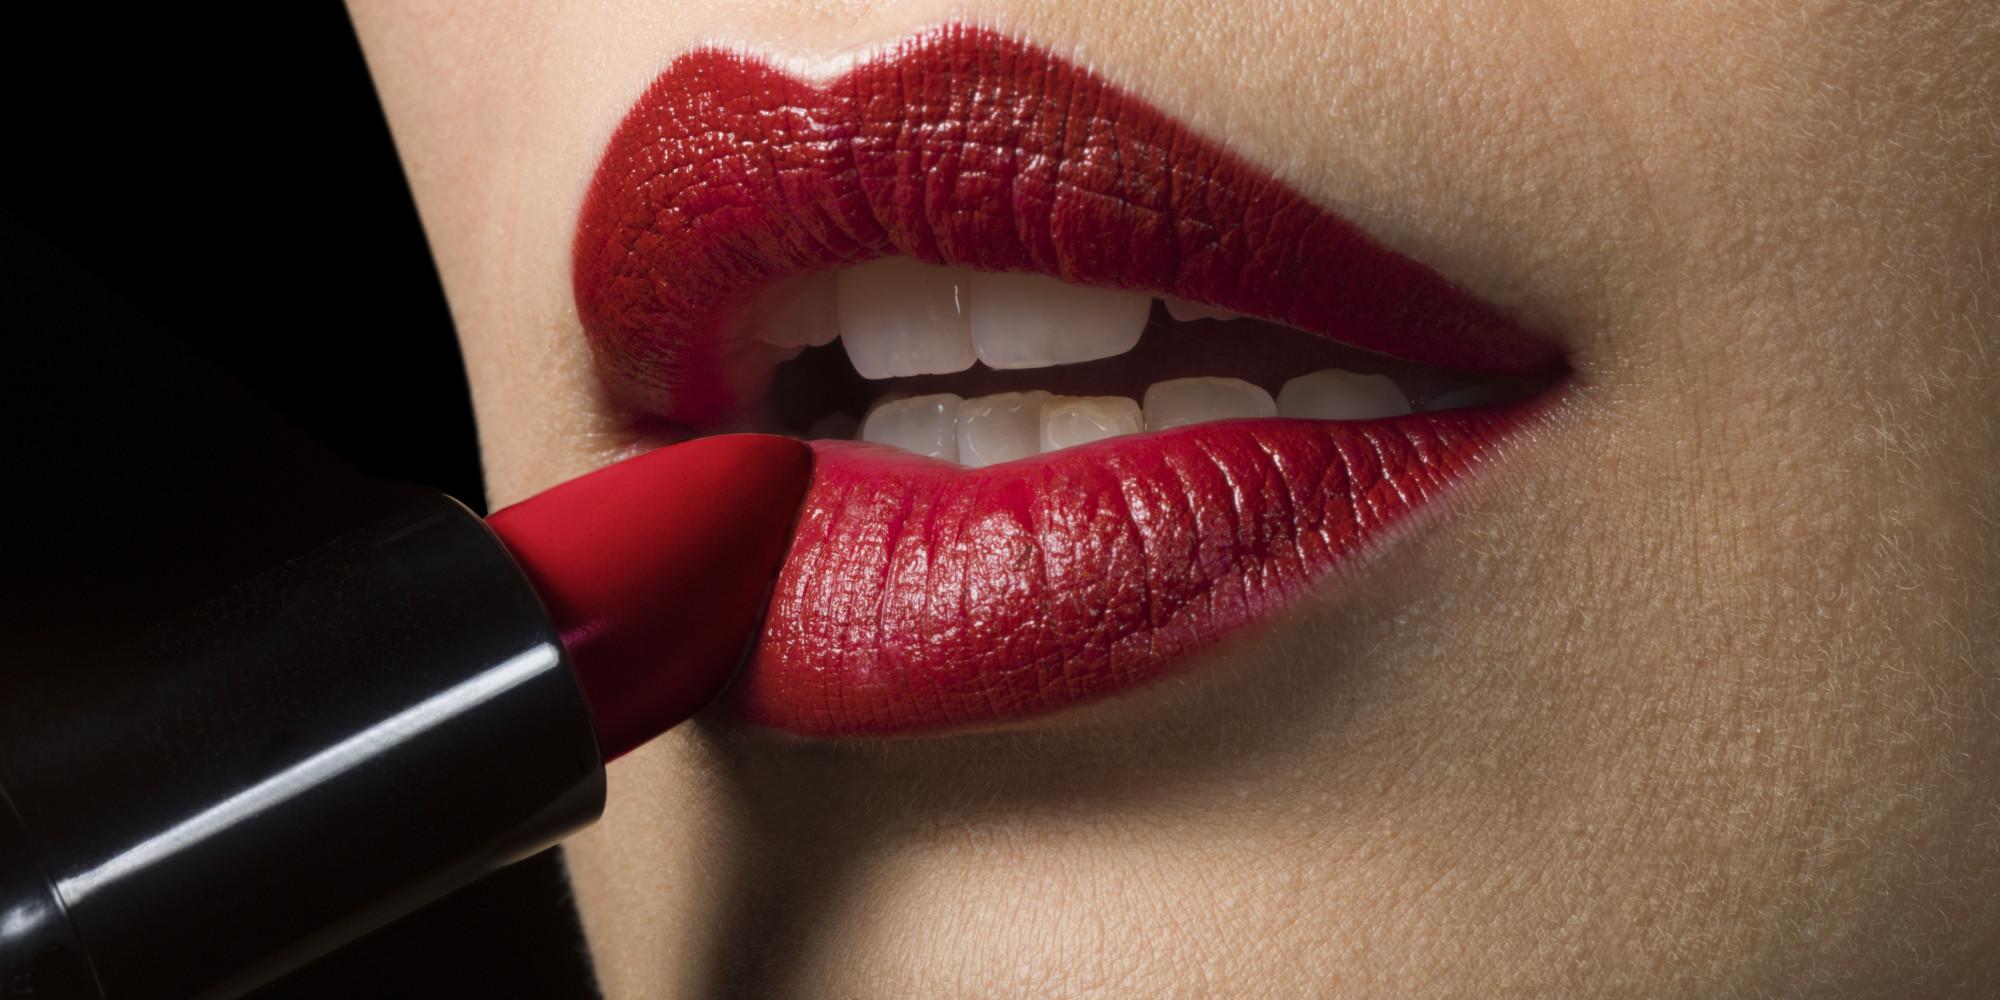 o-red-lips-facebook.jpg